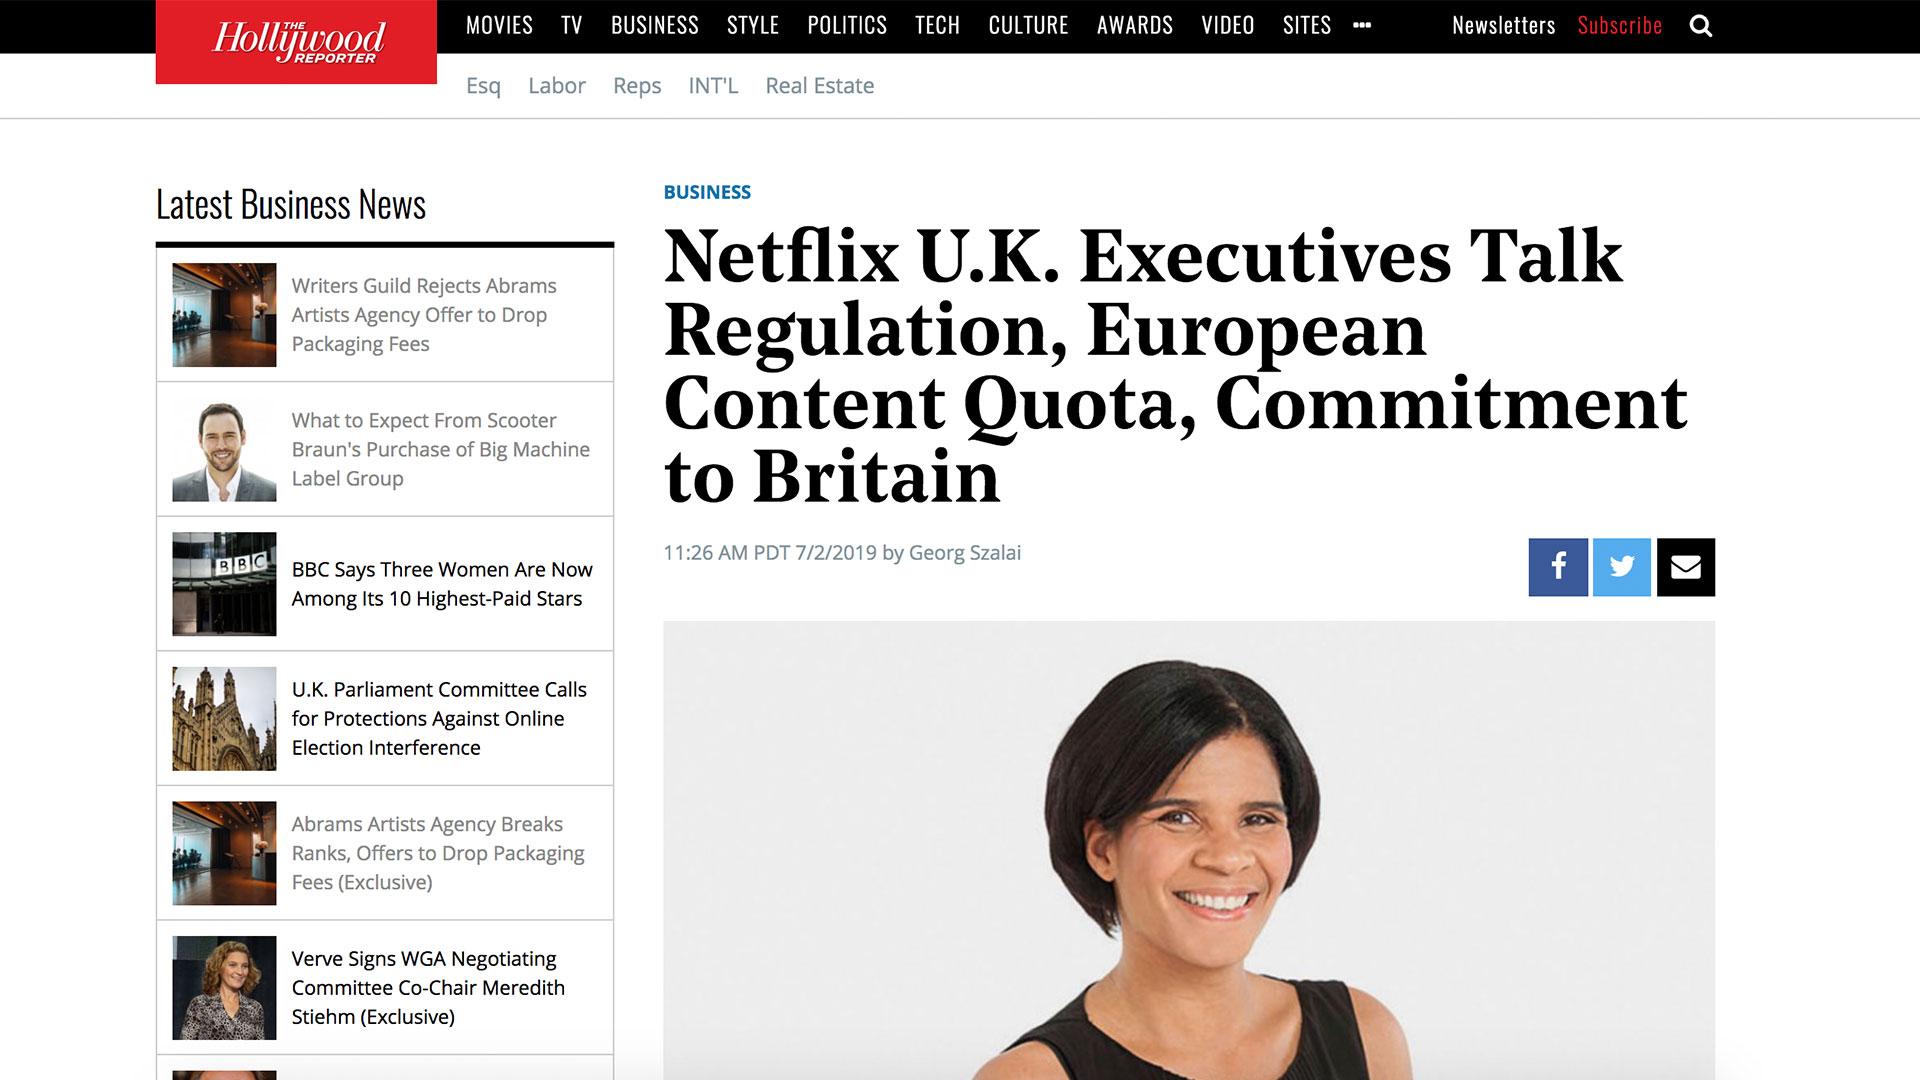 Fairness Rocks News Netflix U.K. Executives Talk Regulation, European Content Quota, Commitment to Britain